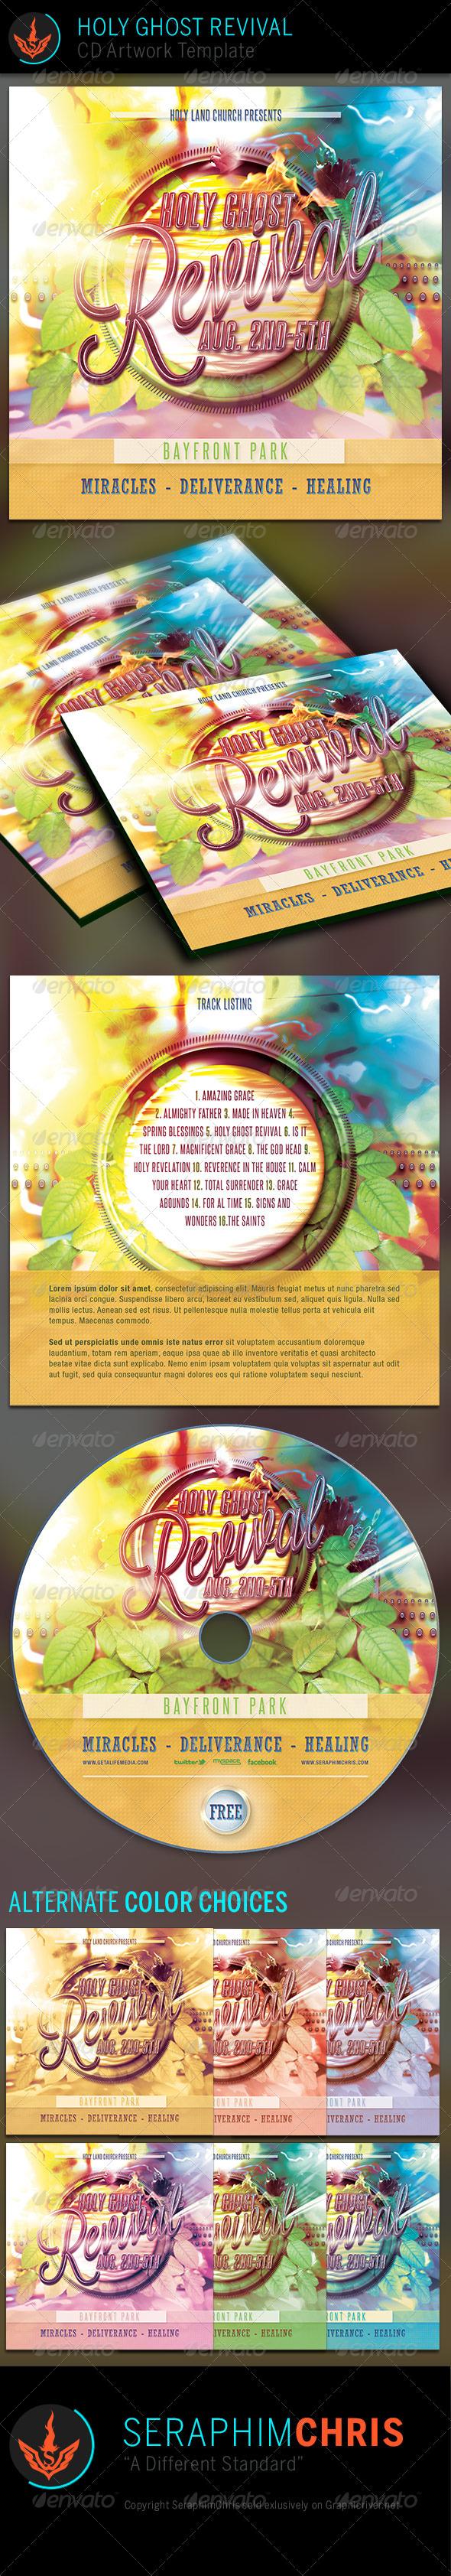 Holy Ghost Revival: CD Artwork Template - CD & DVD Artwork Print Templates